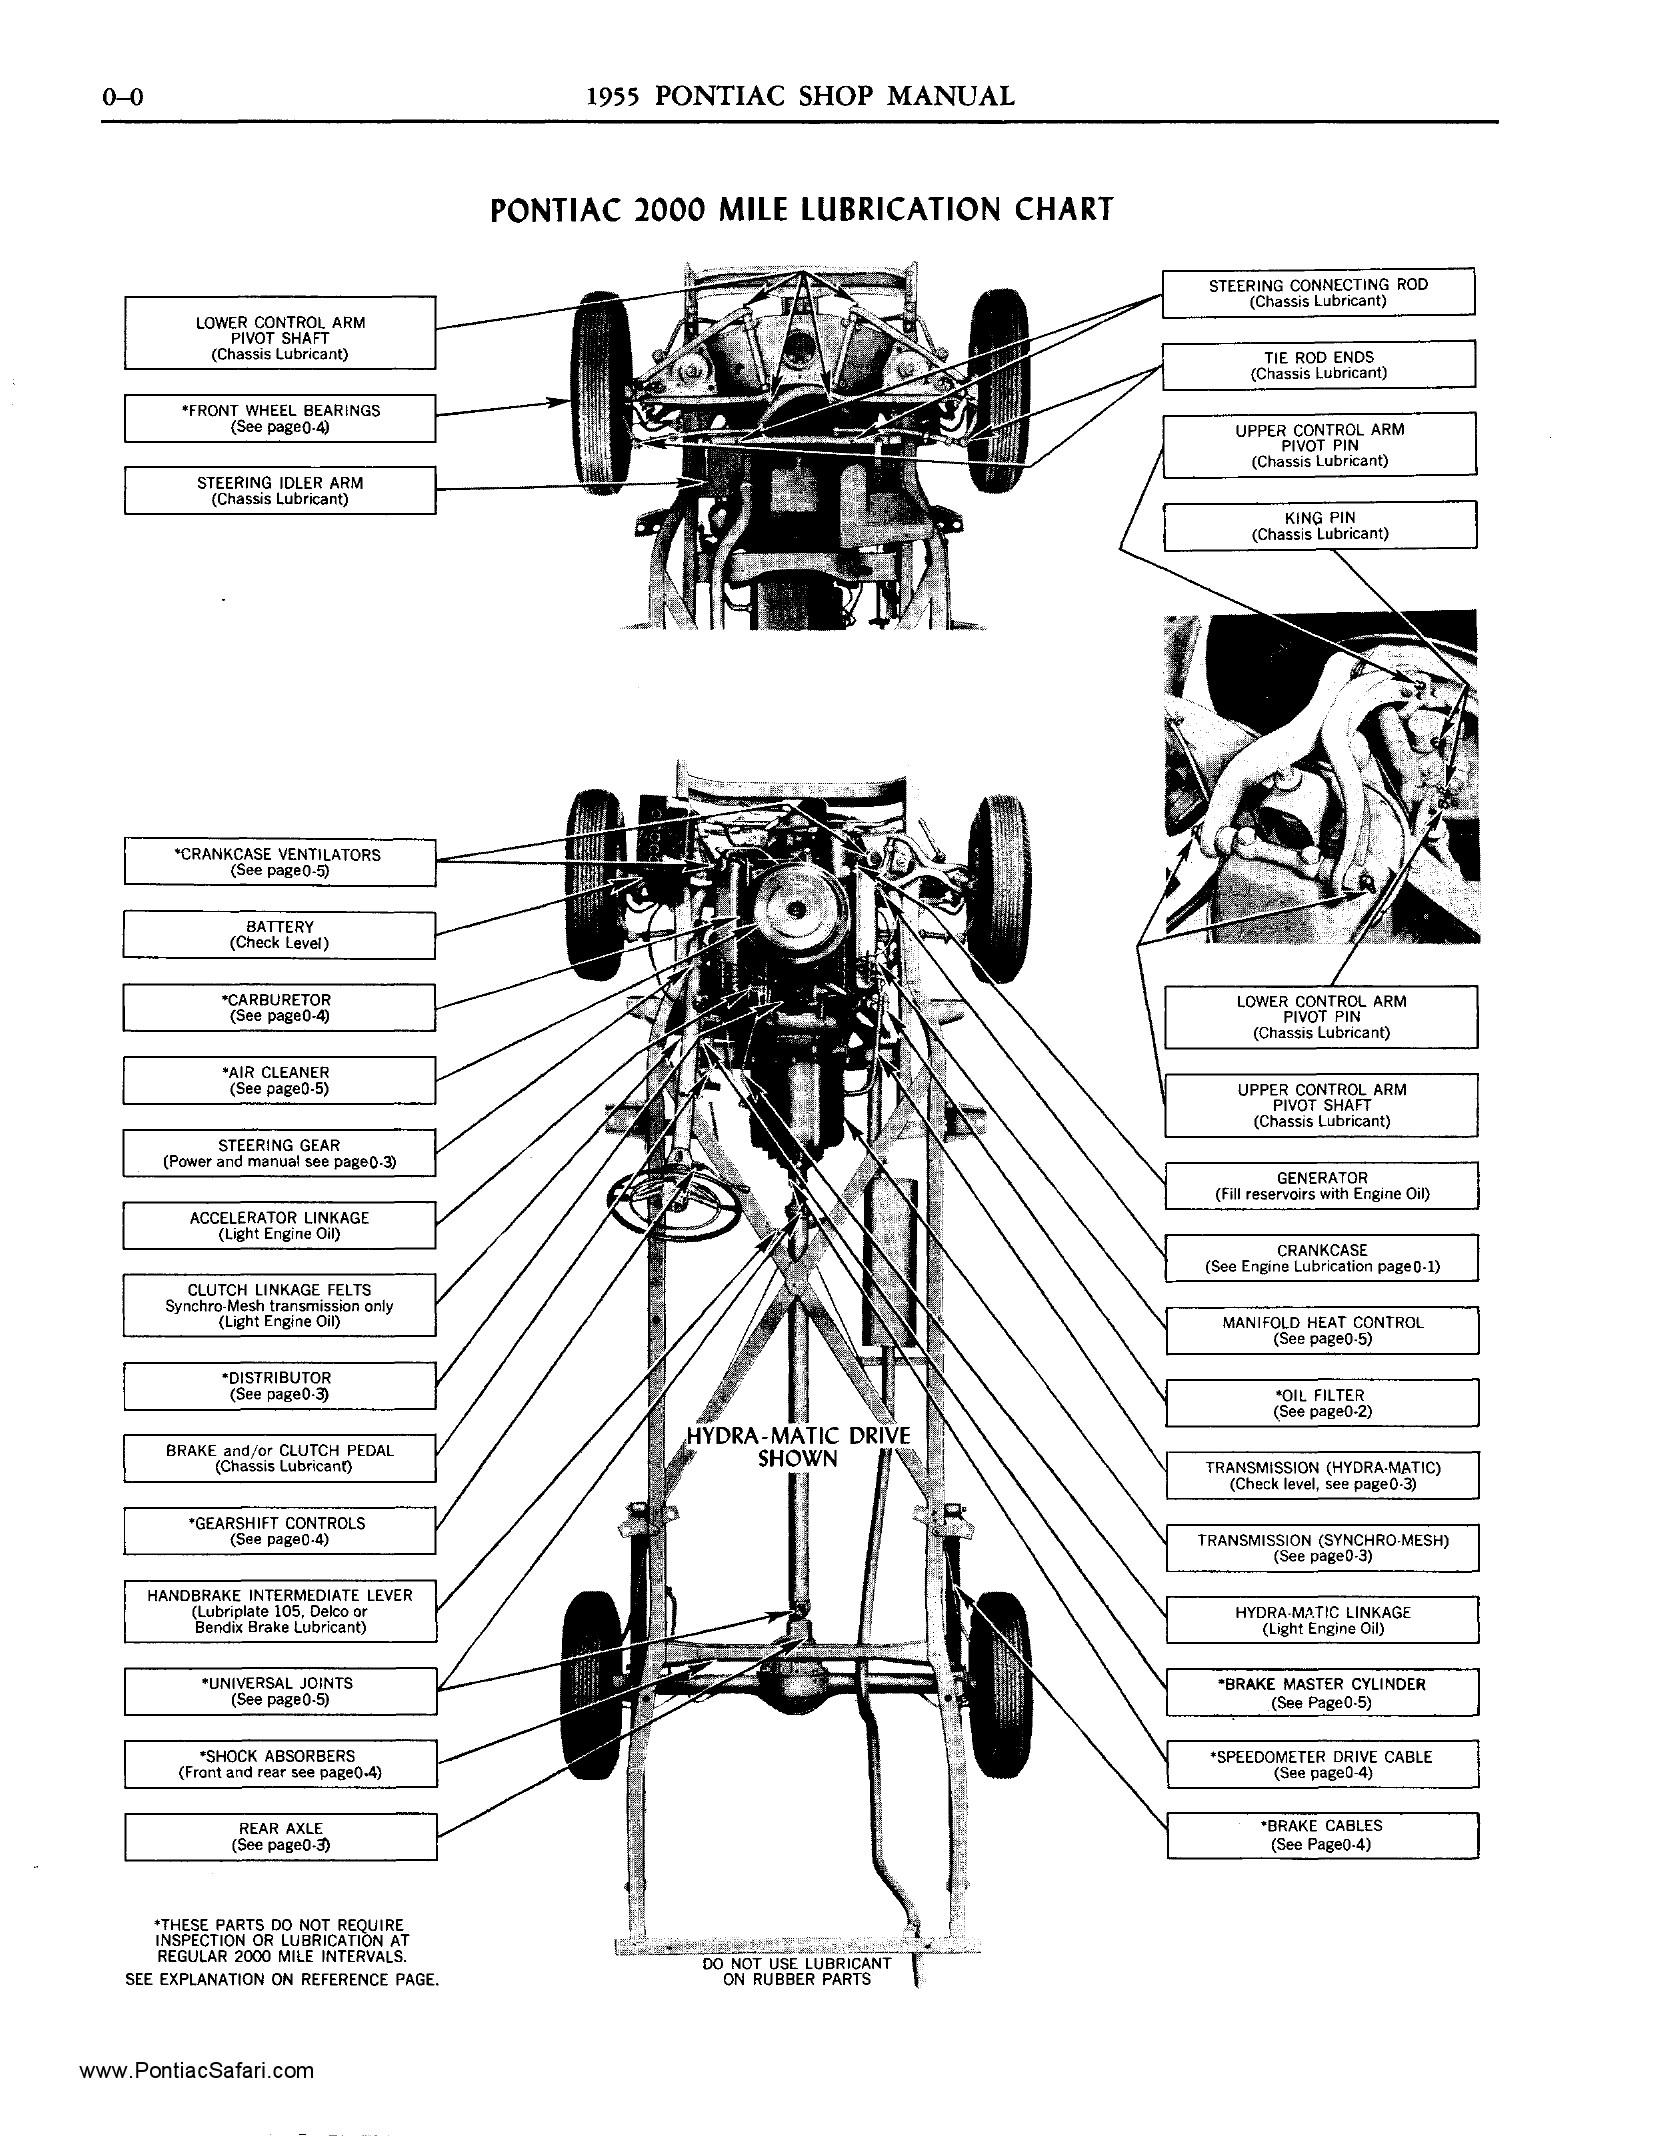 1955 Pontiac Shop Manual- Lubrication Page 1 of 8